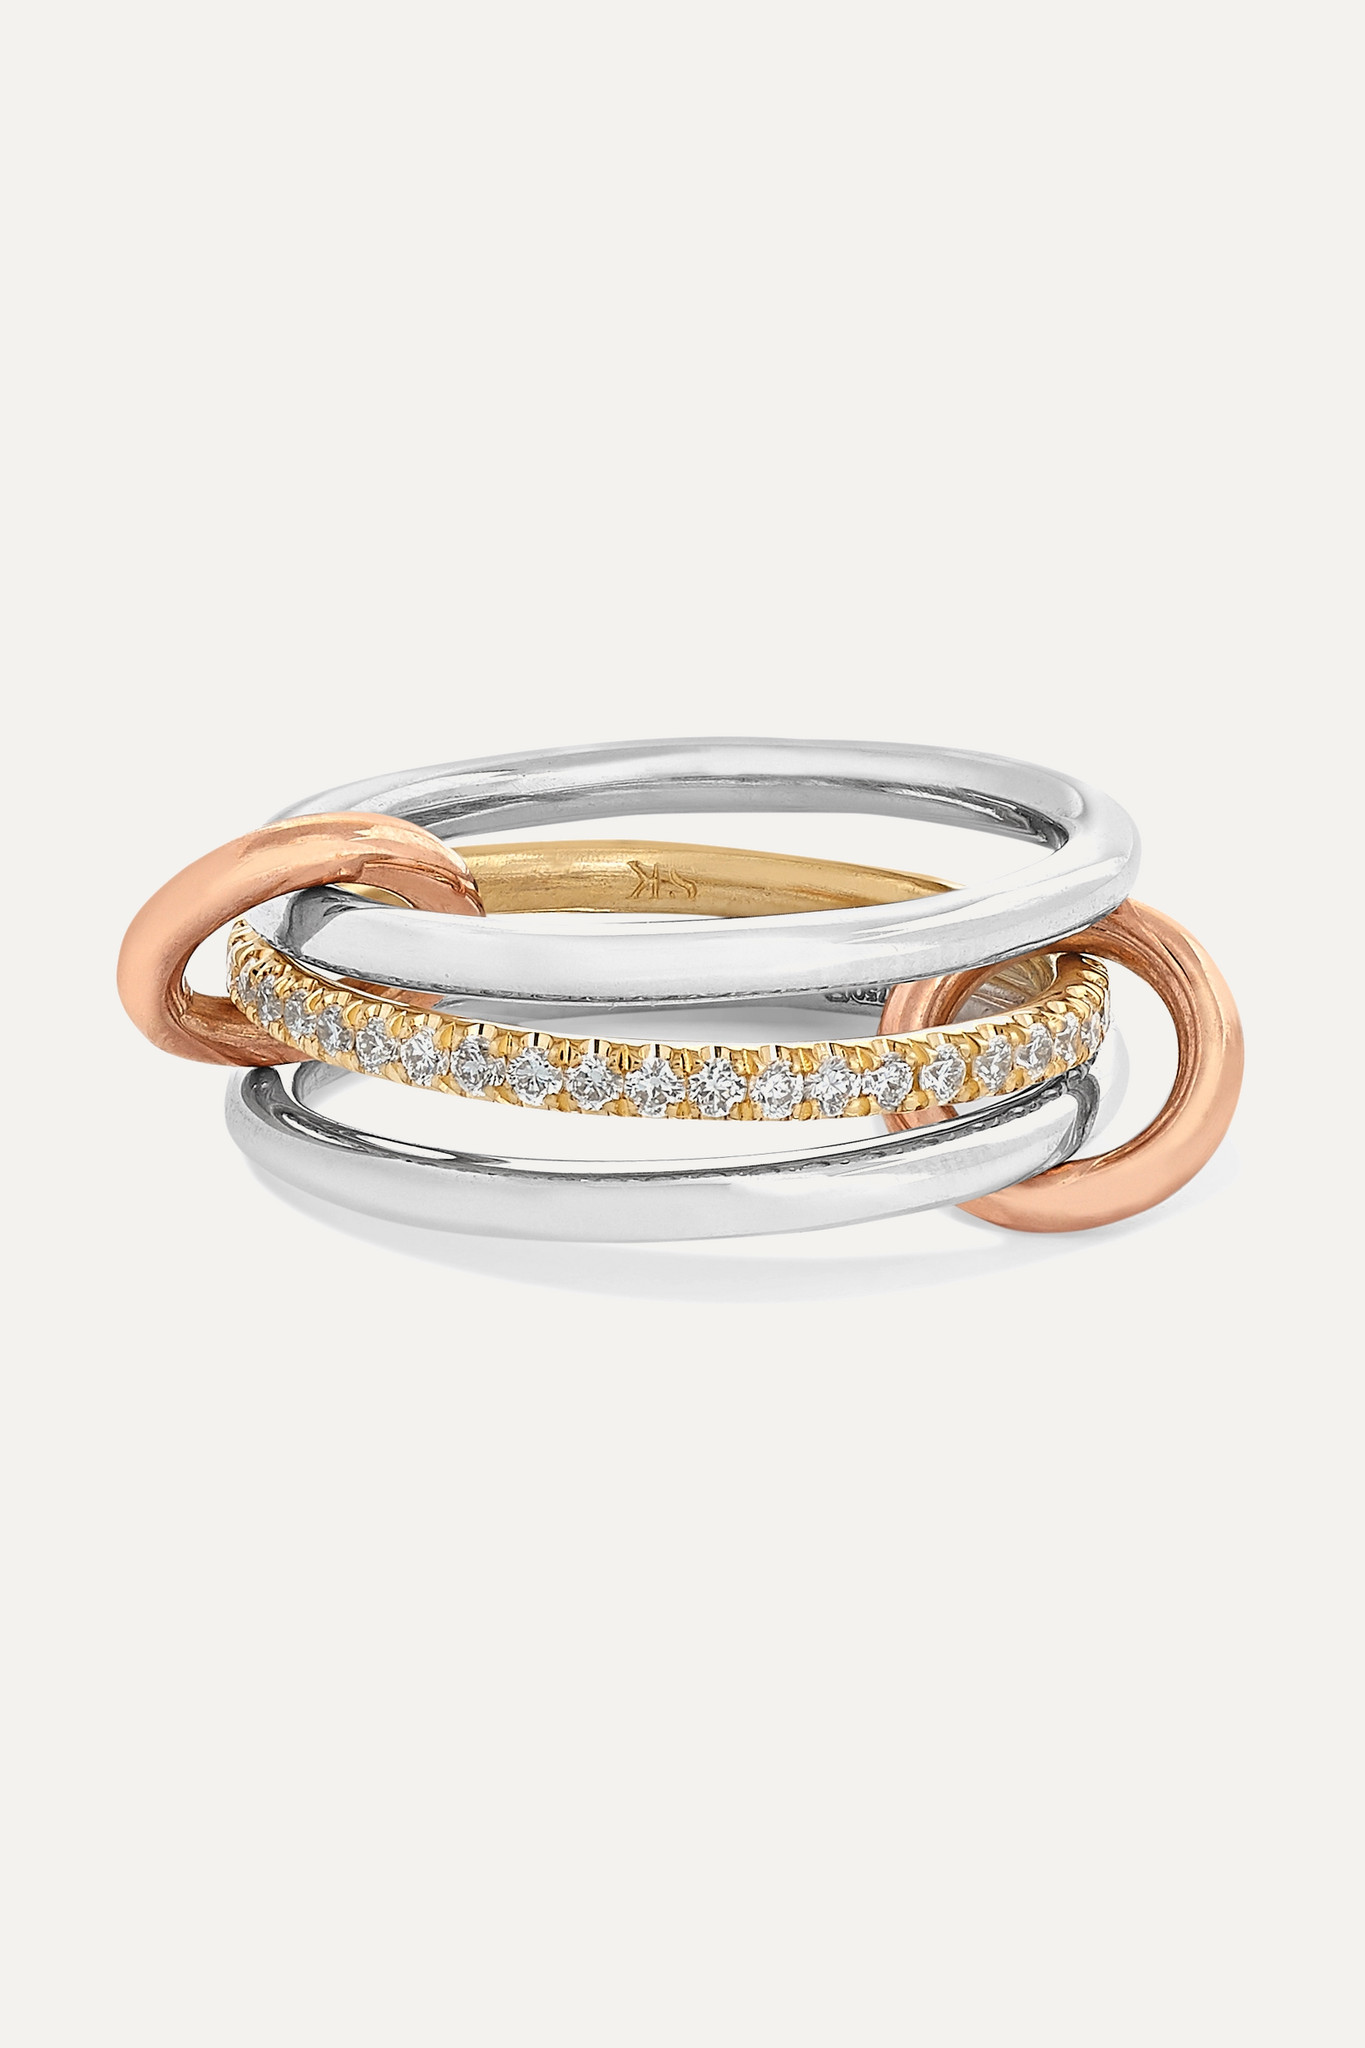 SPINELLI KILCOLLIN - Sonny Set Of Three 18-karat White, Yellow And Rose Gold Diamond Rings - White g